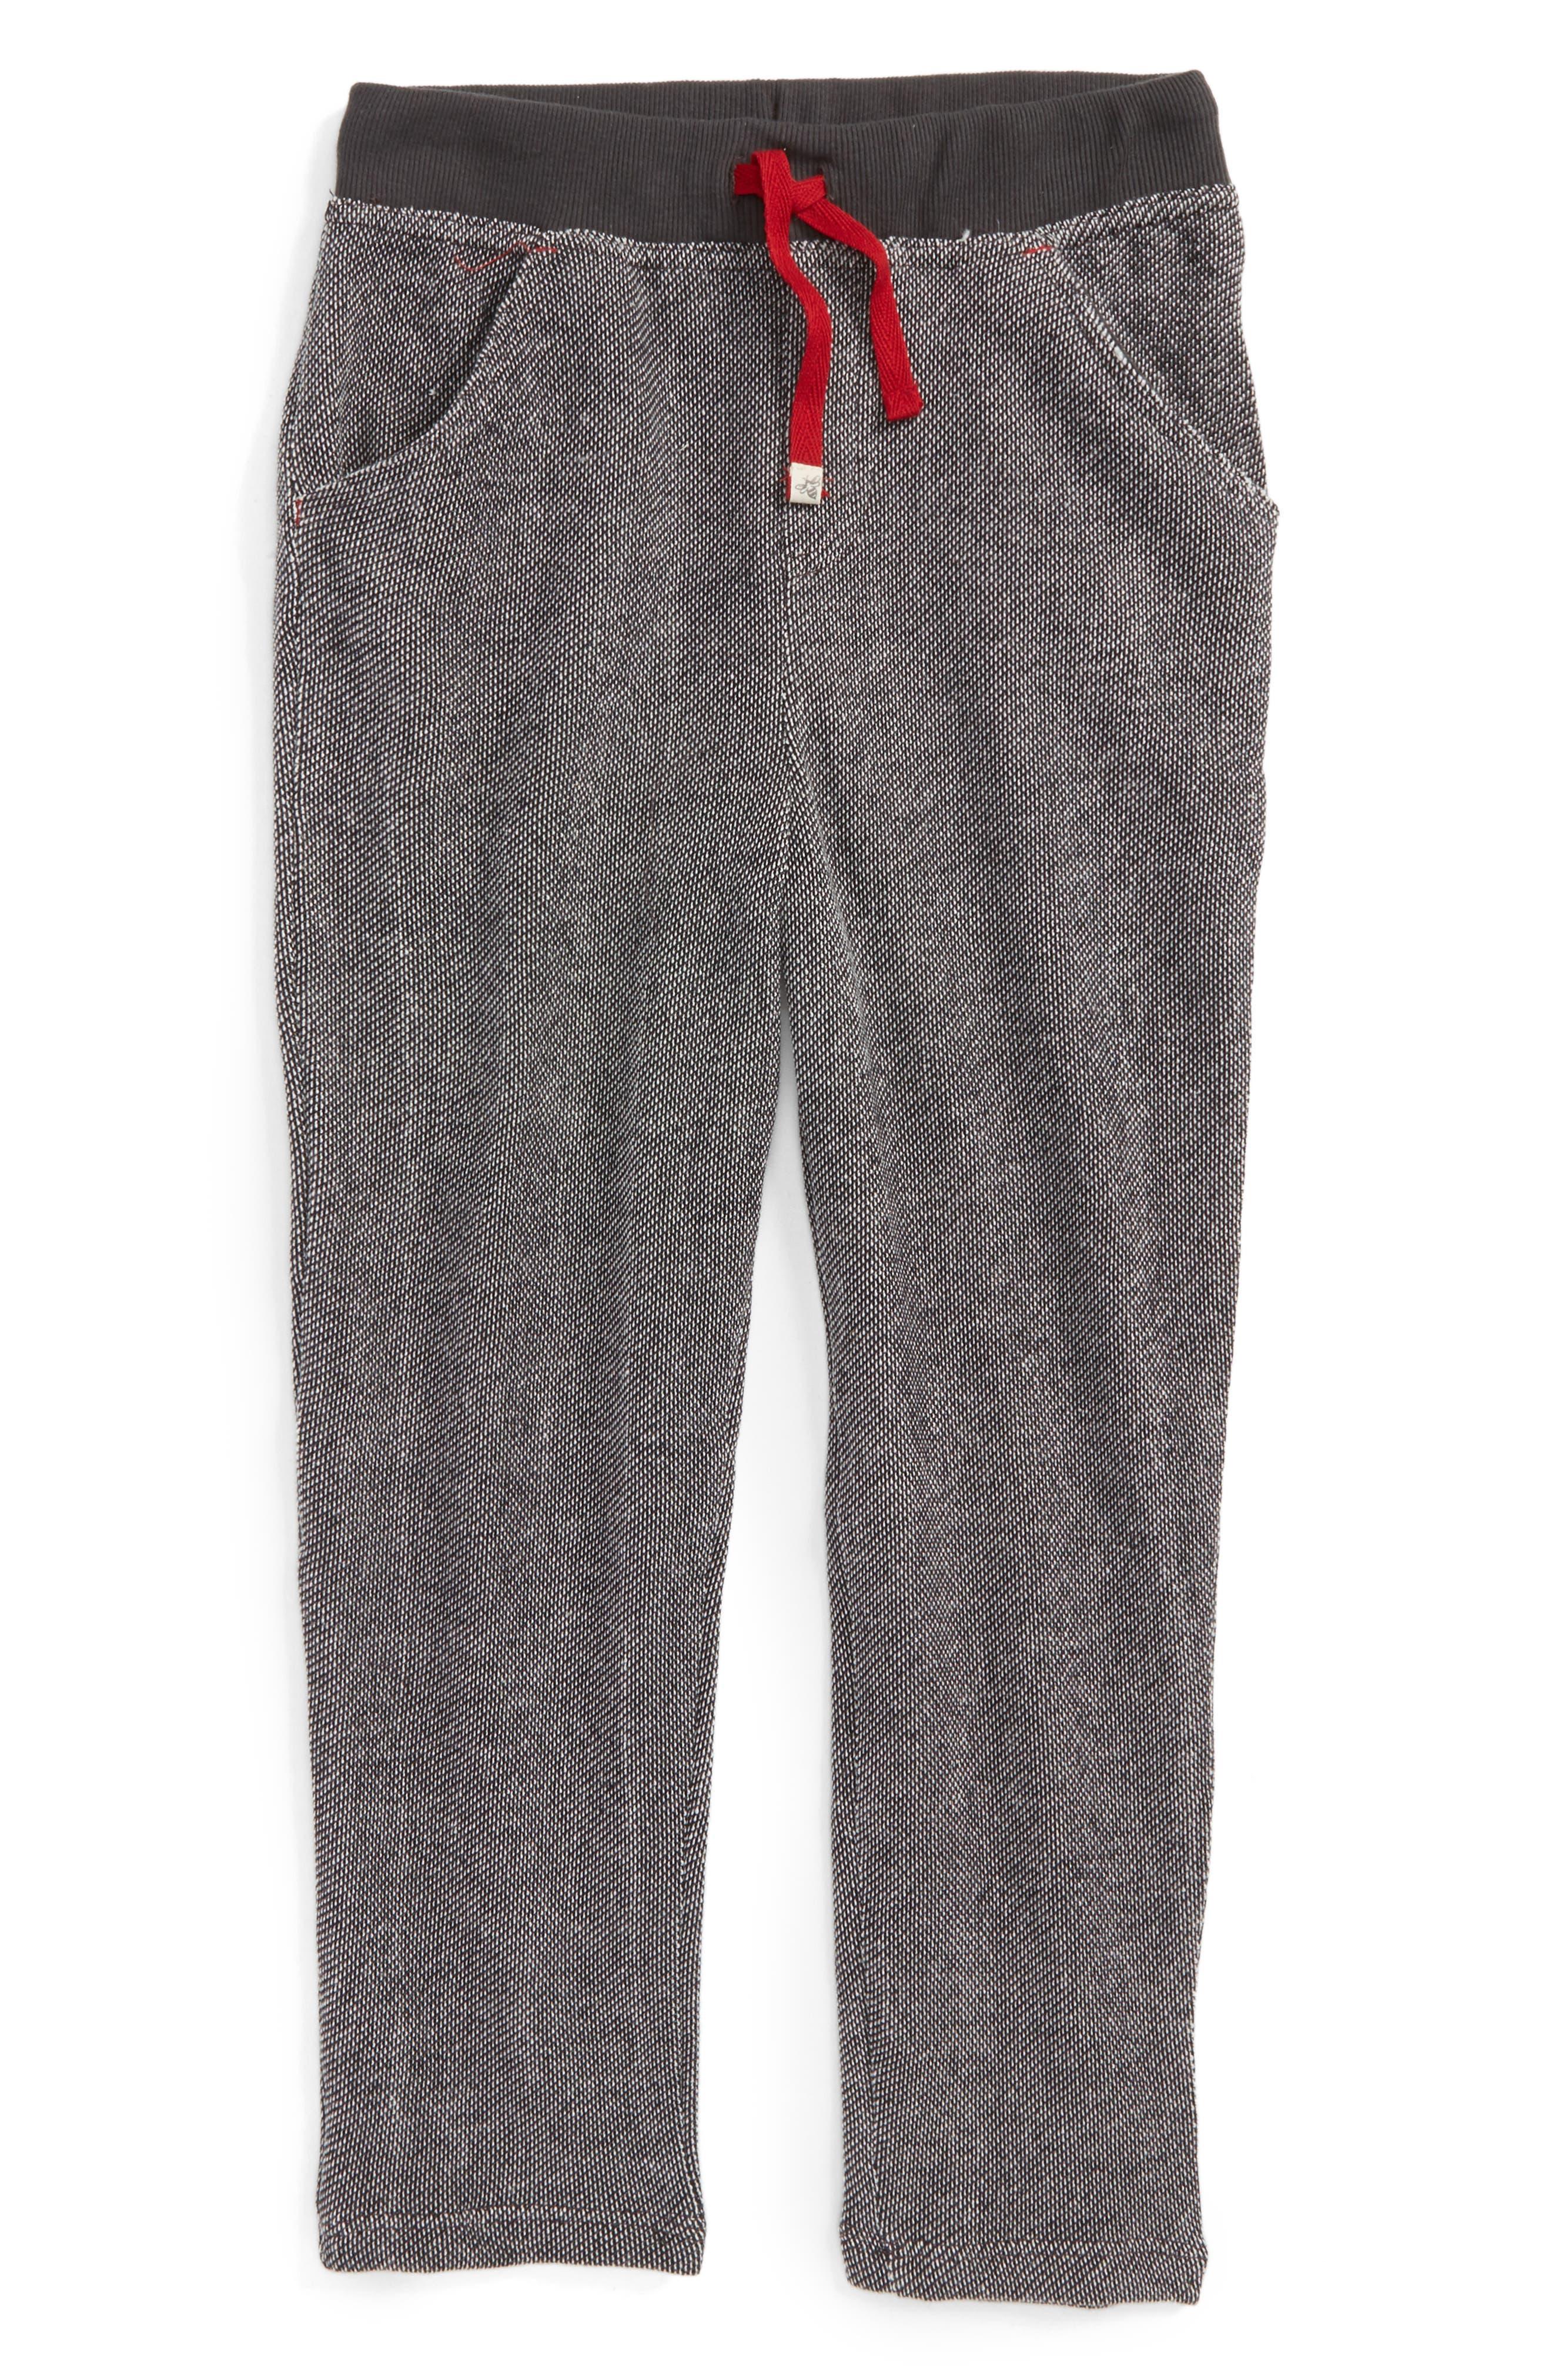 Burt's Bees Baby Piqué Organic Cotton Pants (Toddler Boys & Little Boys)